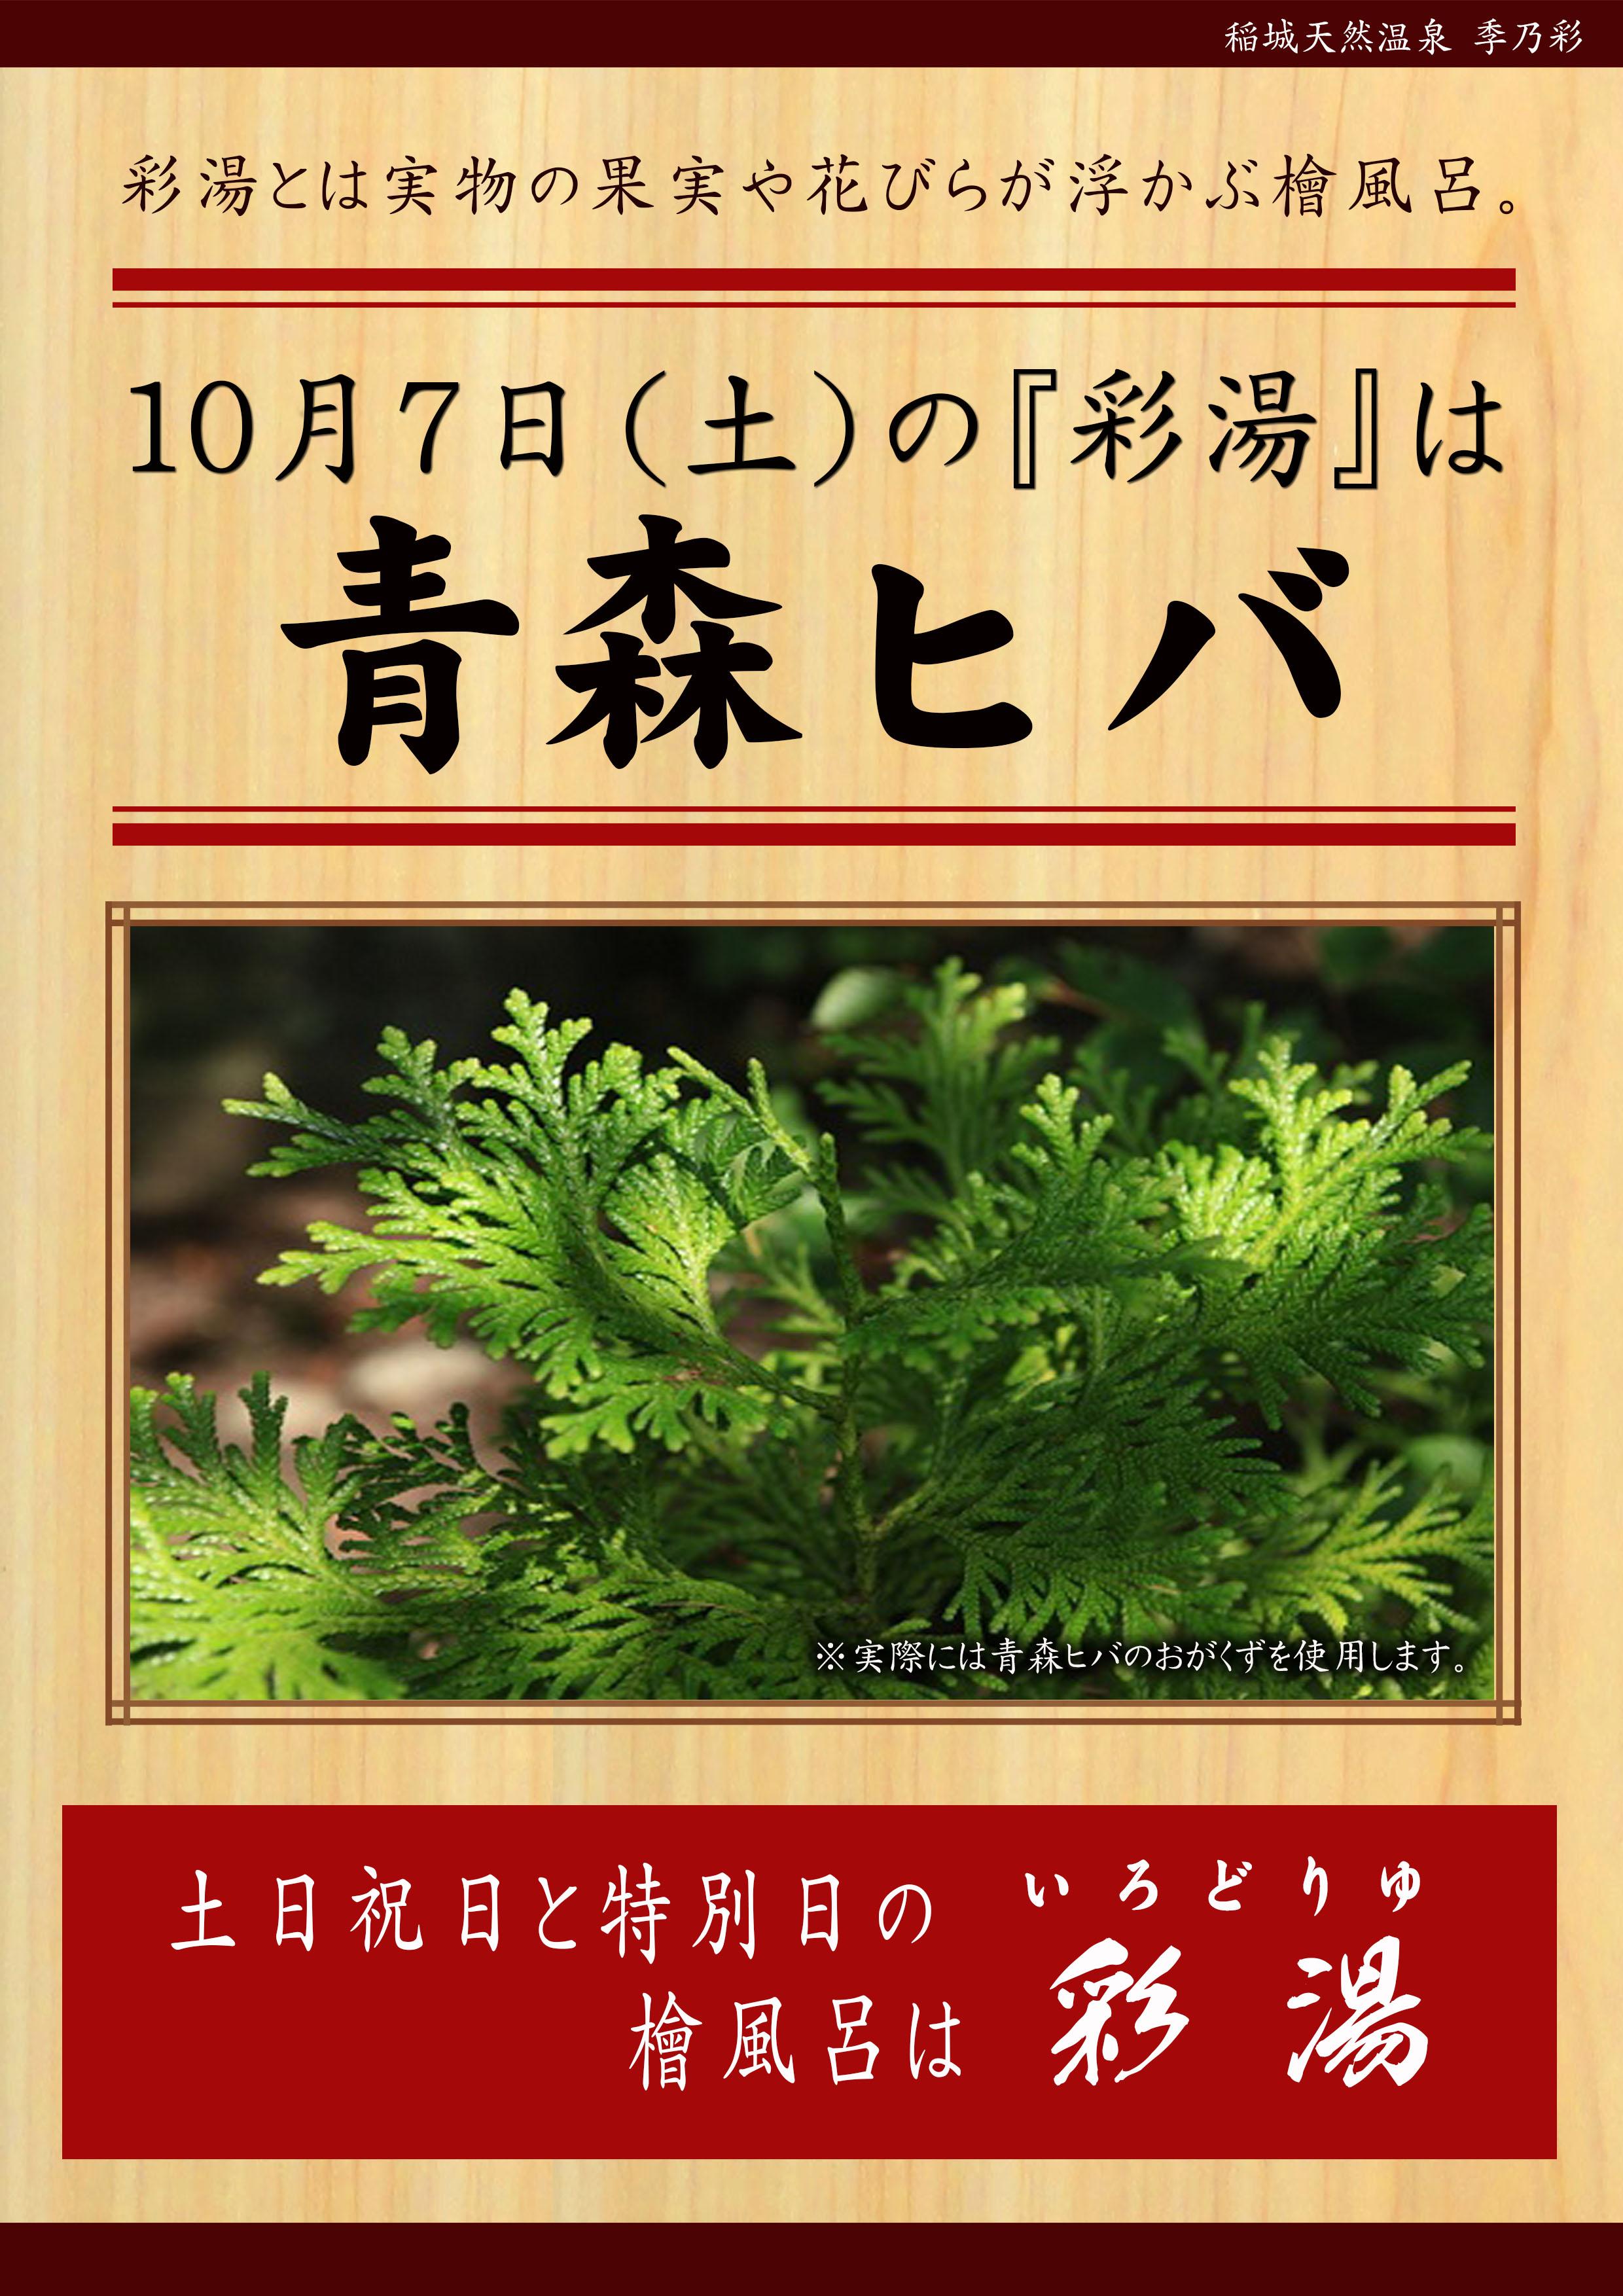 20171007POP イベント 彩湯 青森ヒバ